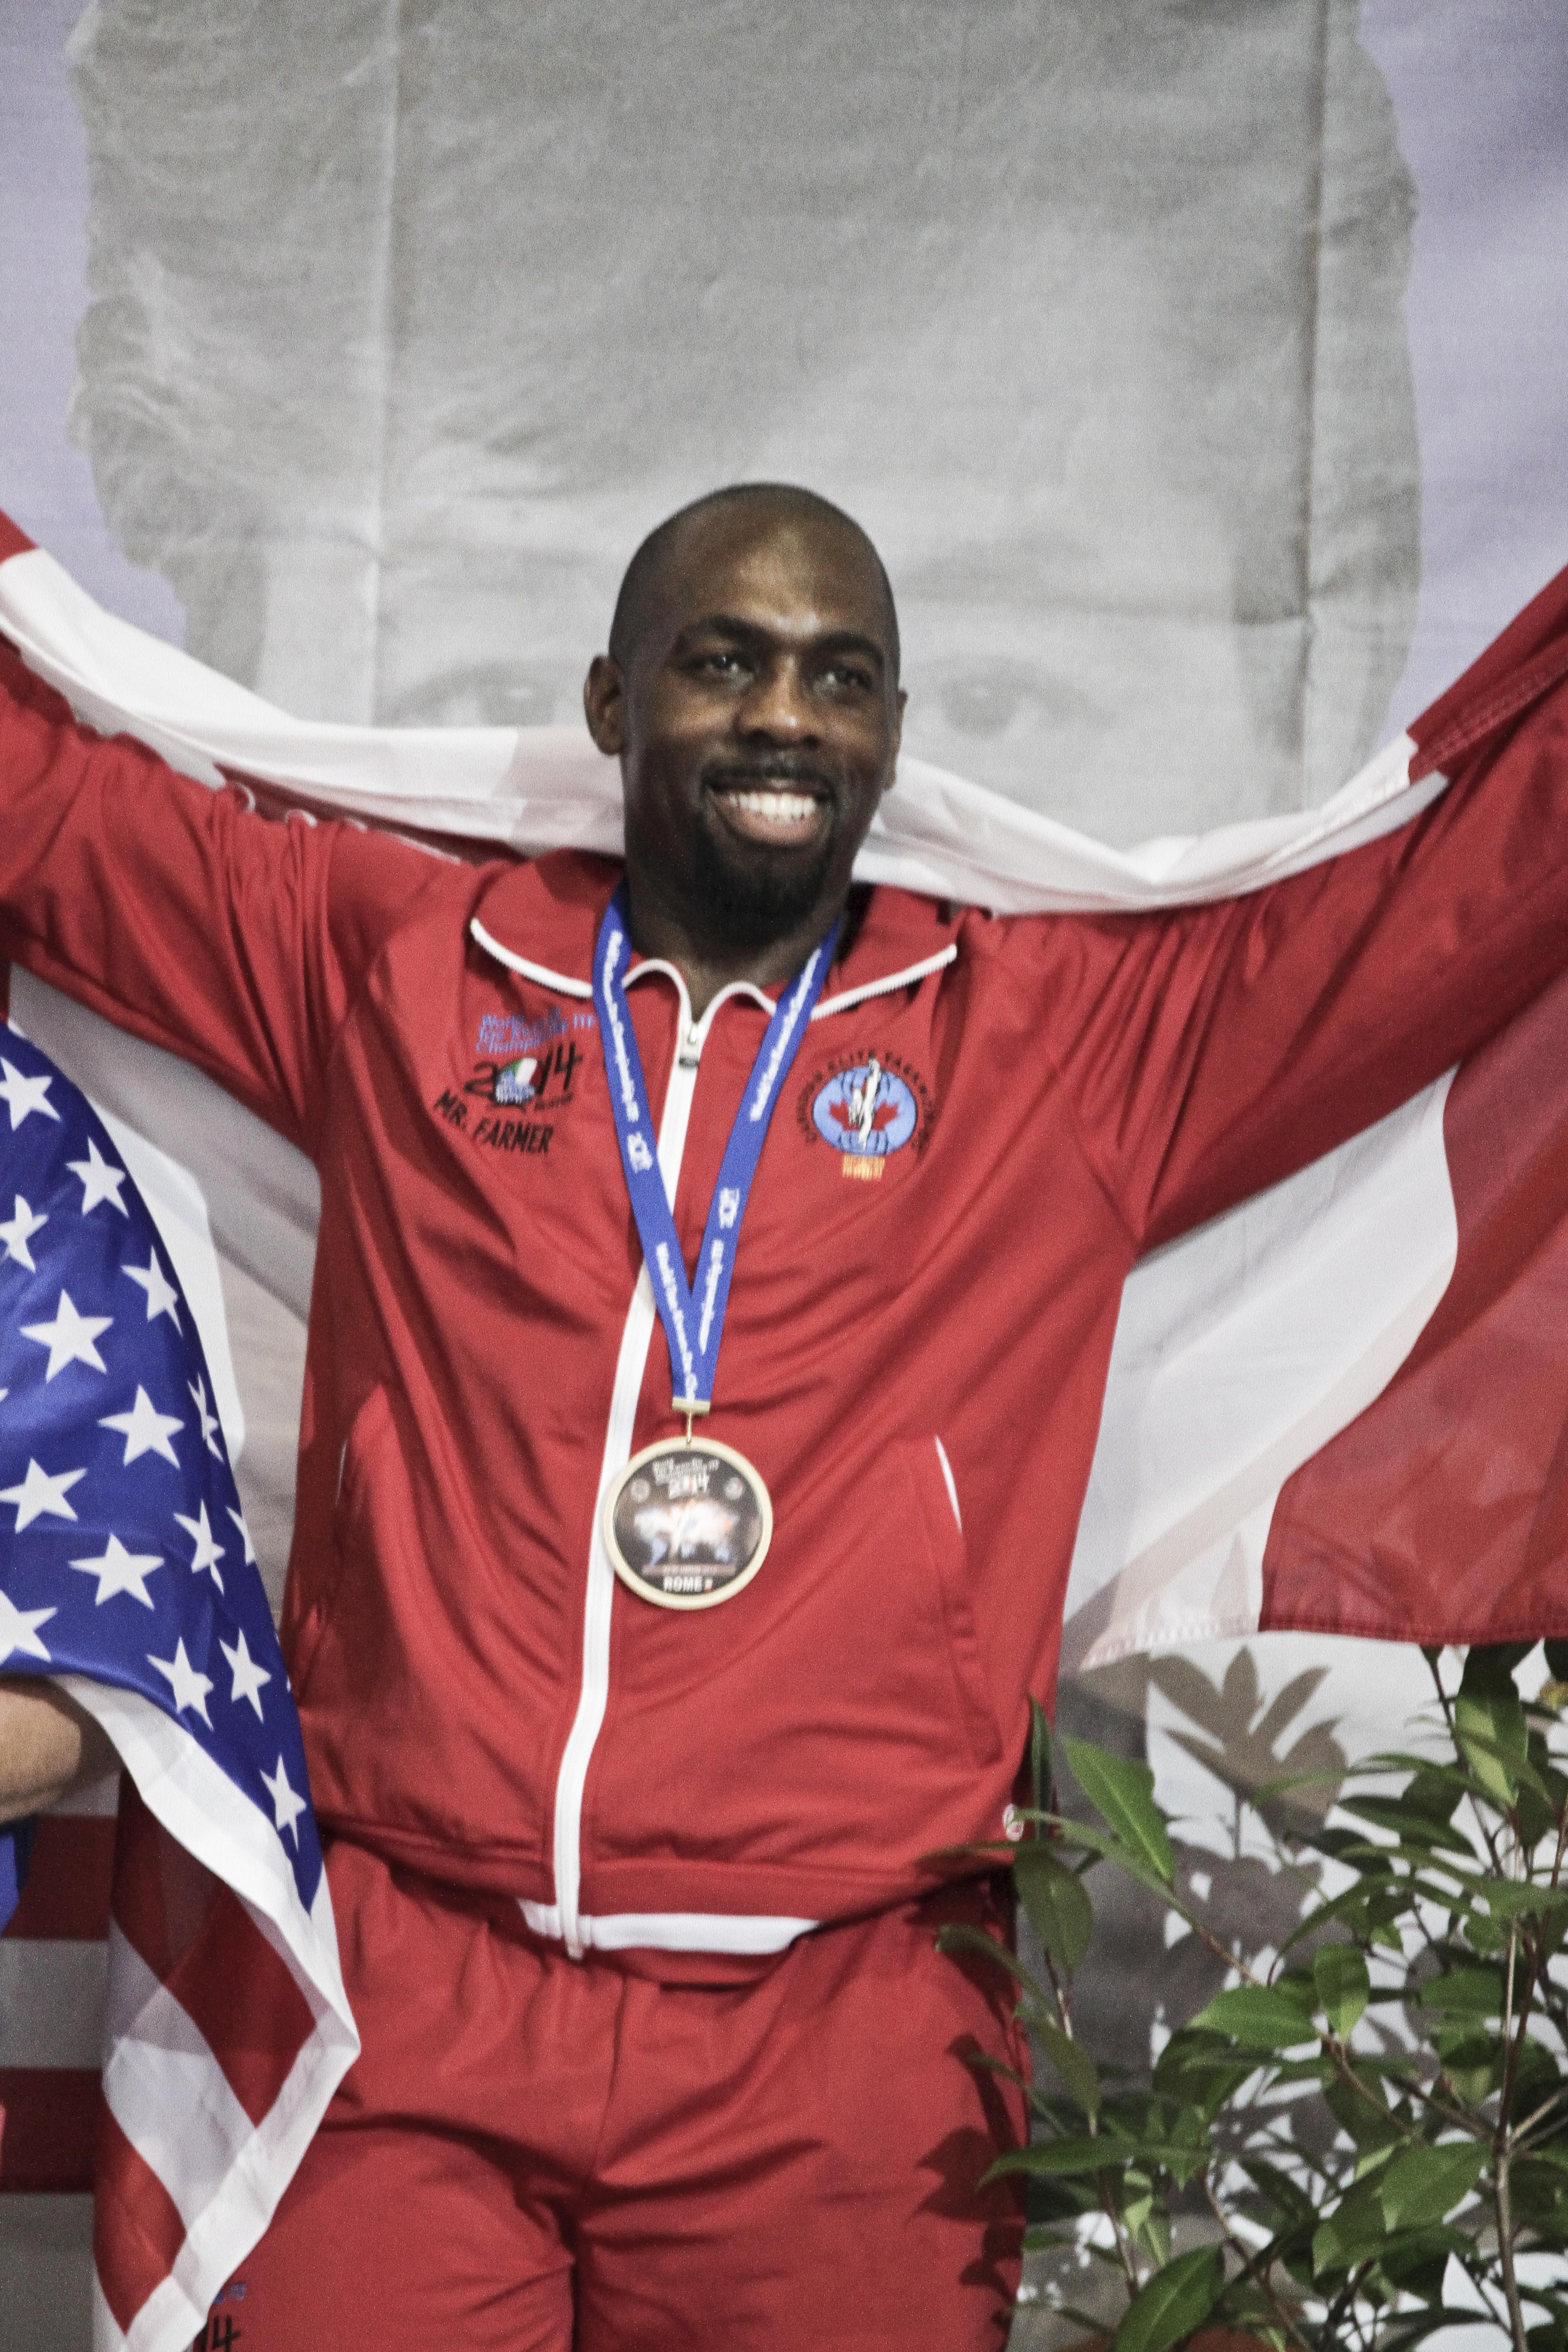 Mr. El Bey - 2 X Bronze Medalist